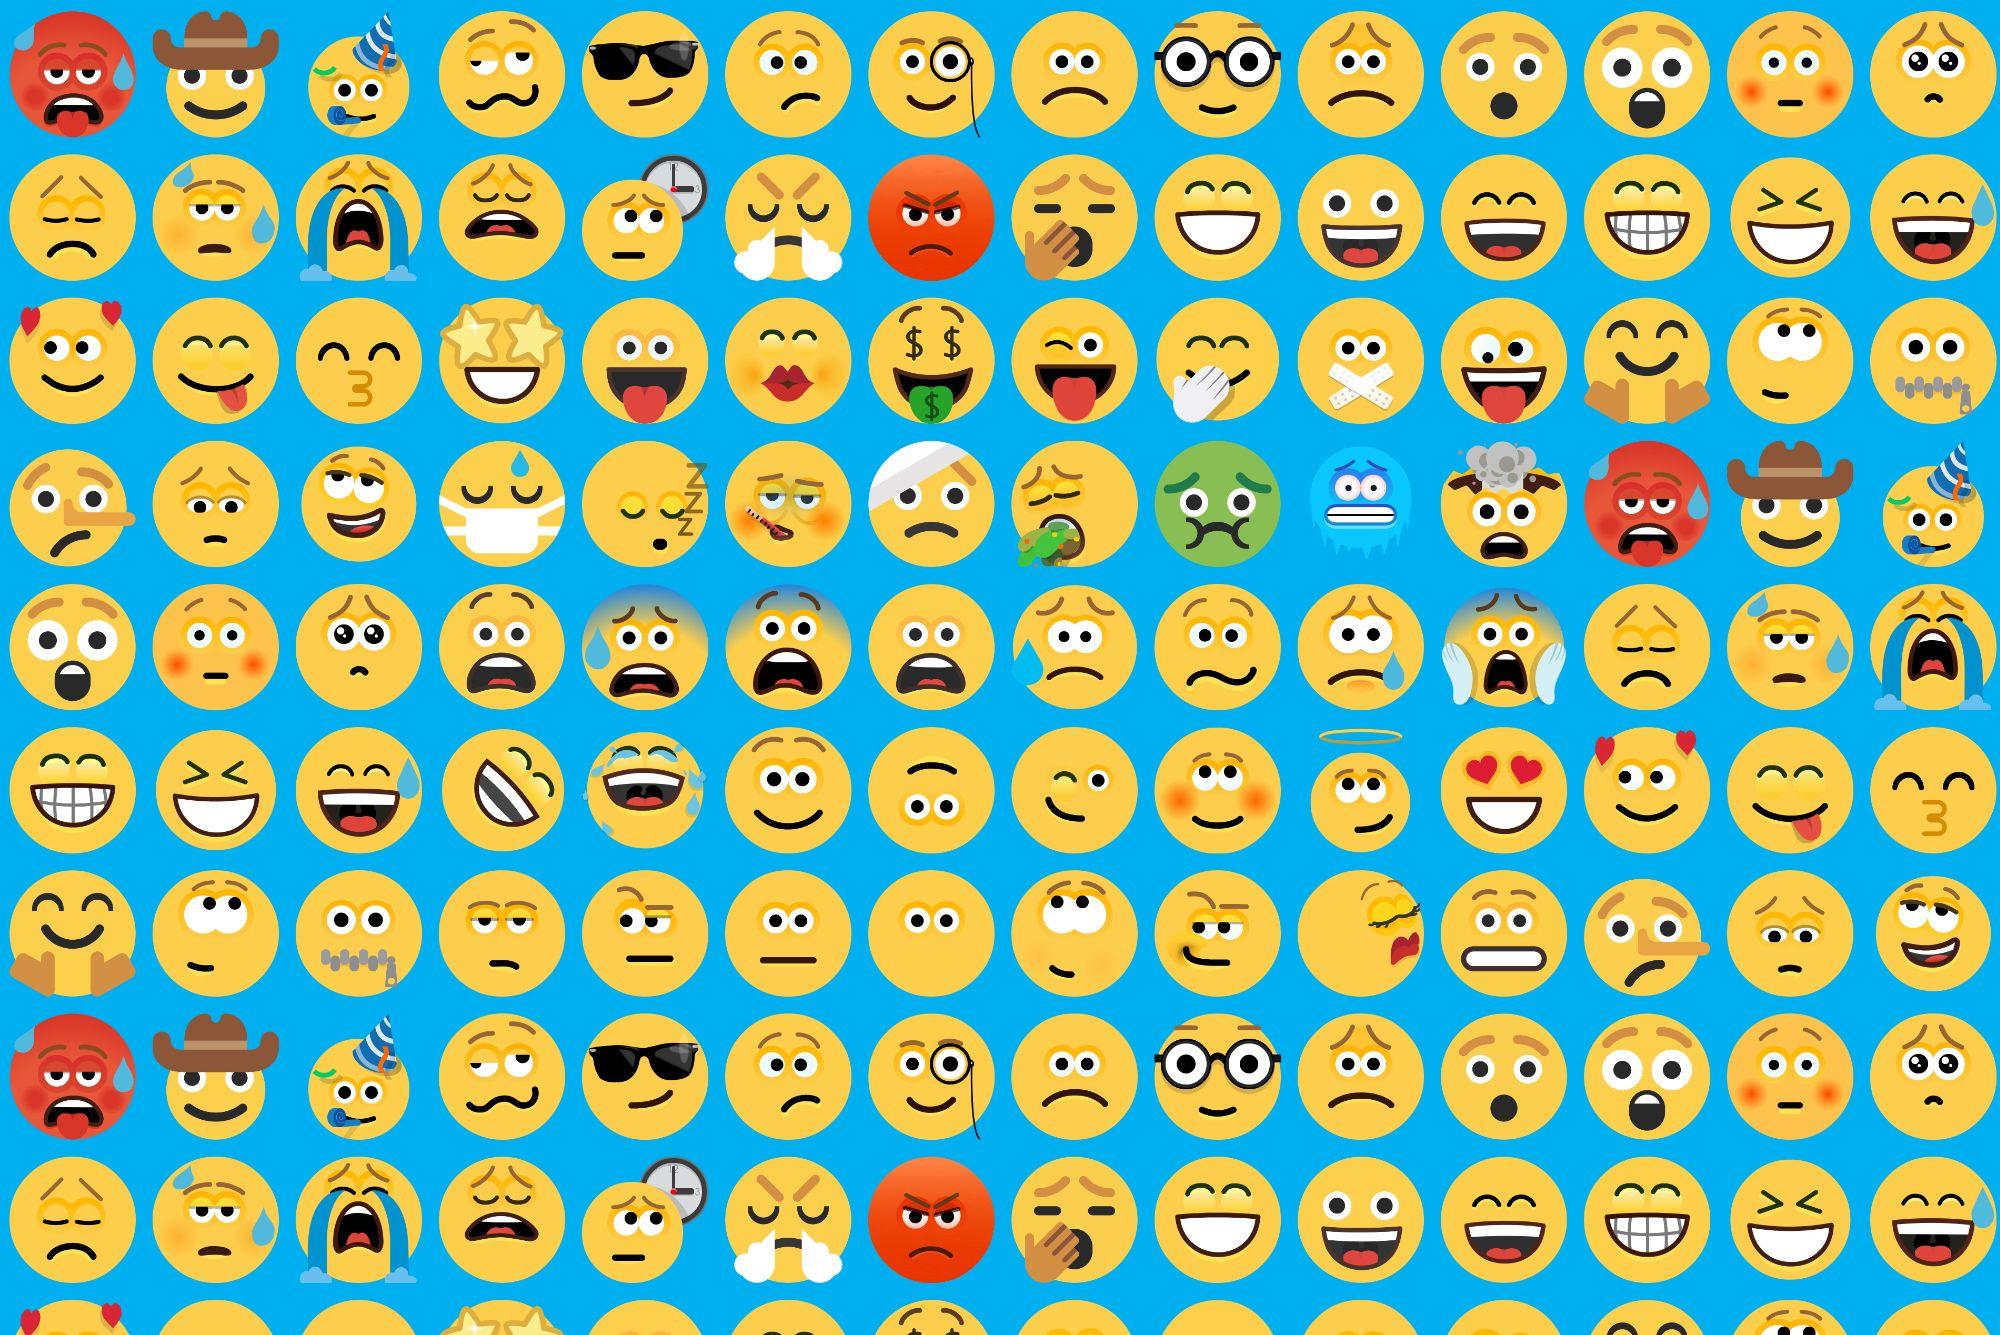 Skype smiley Skype Emoticon